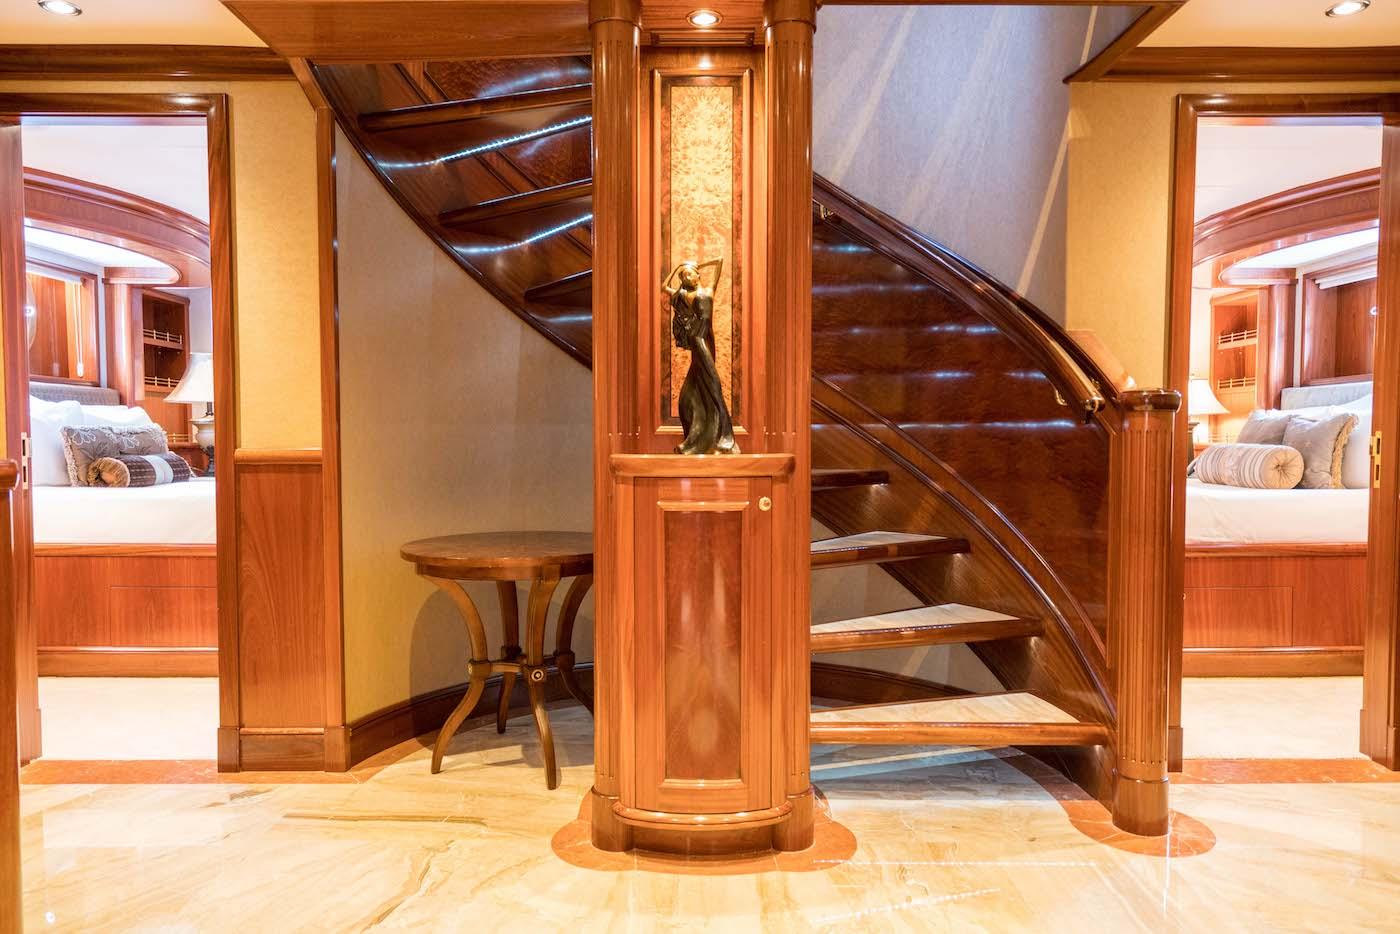 Foyer Stateroom